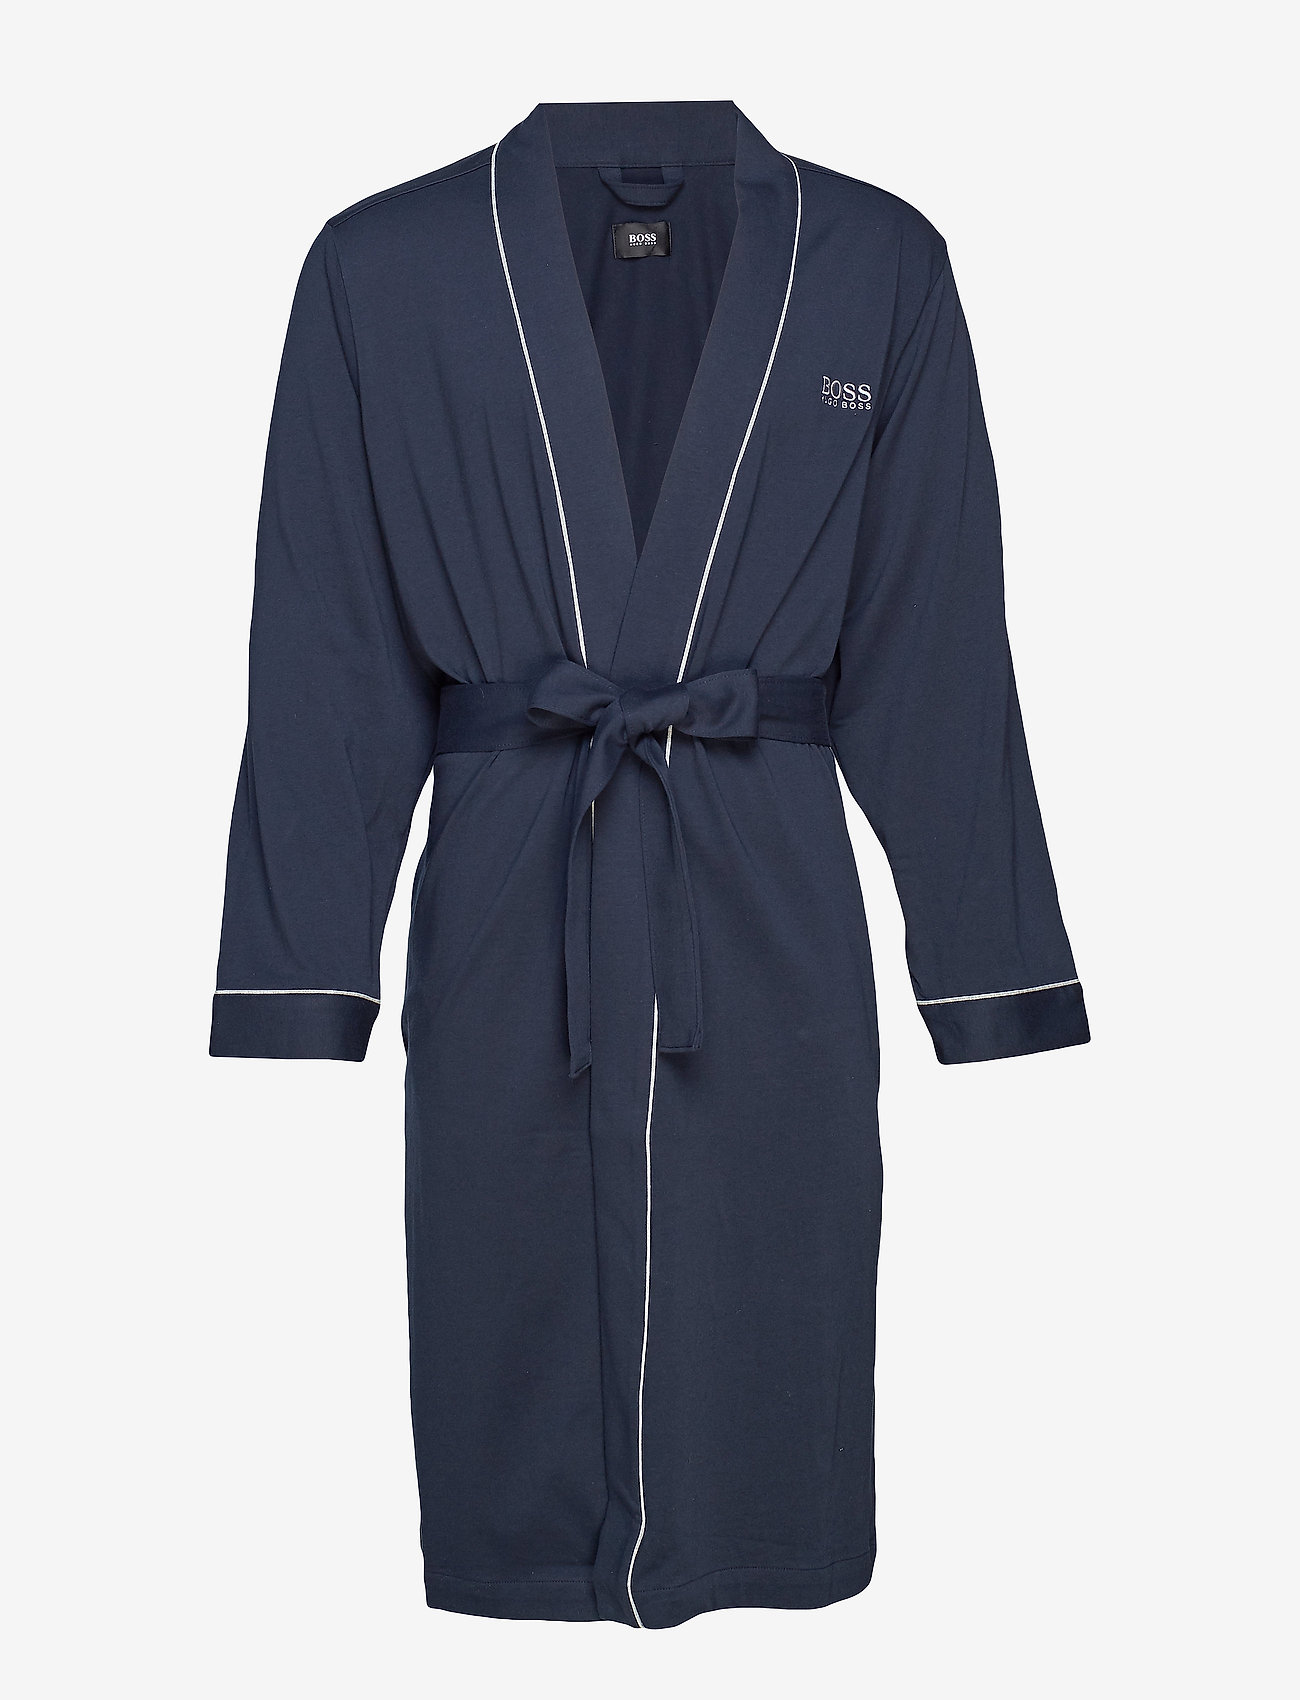 BOSS - Kimono BM - morgenkåper - dark blue - 0